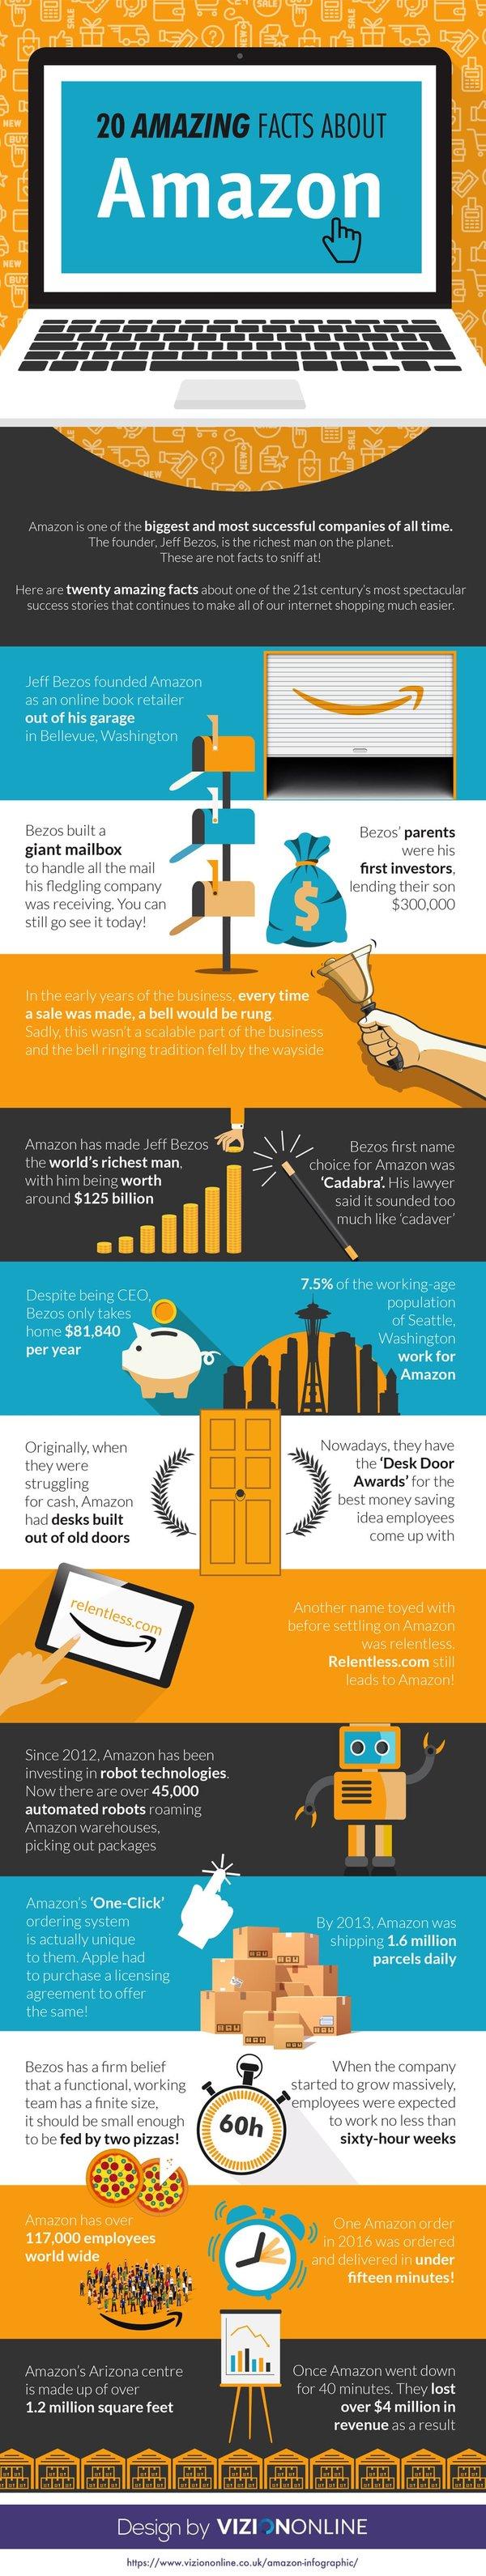 20 Amazing Facts About Amazon